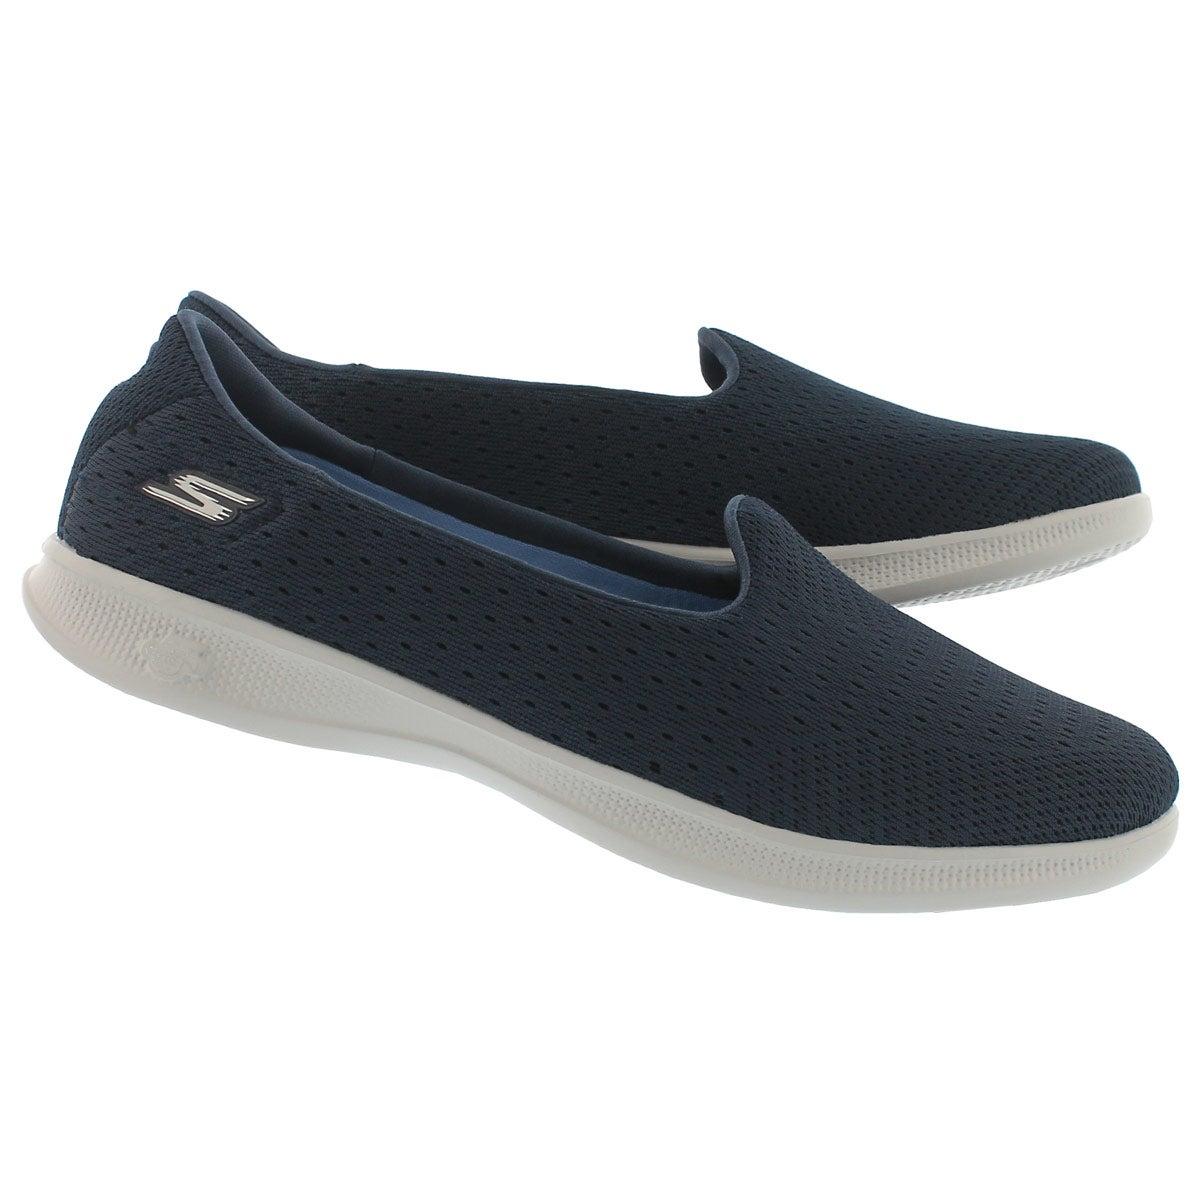 Lds GO Step Lite Origin nvy walking shoe